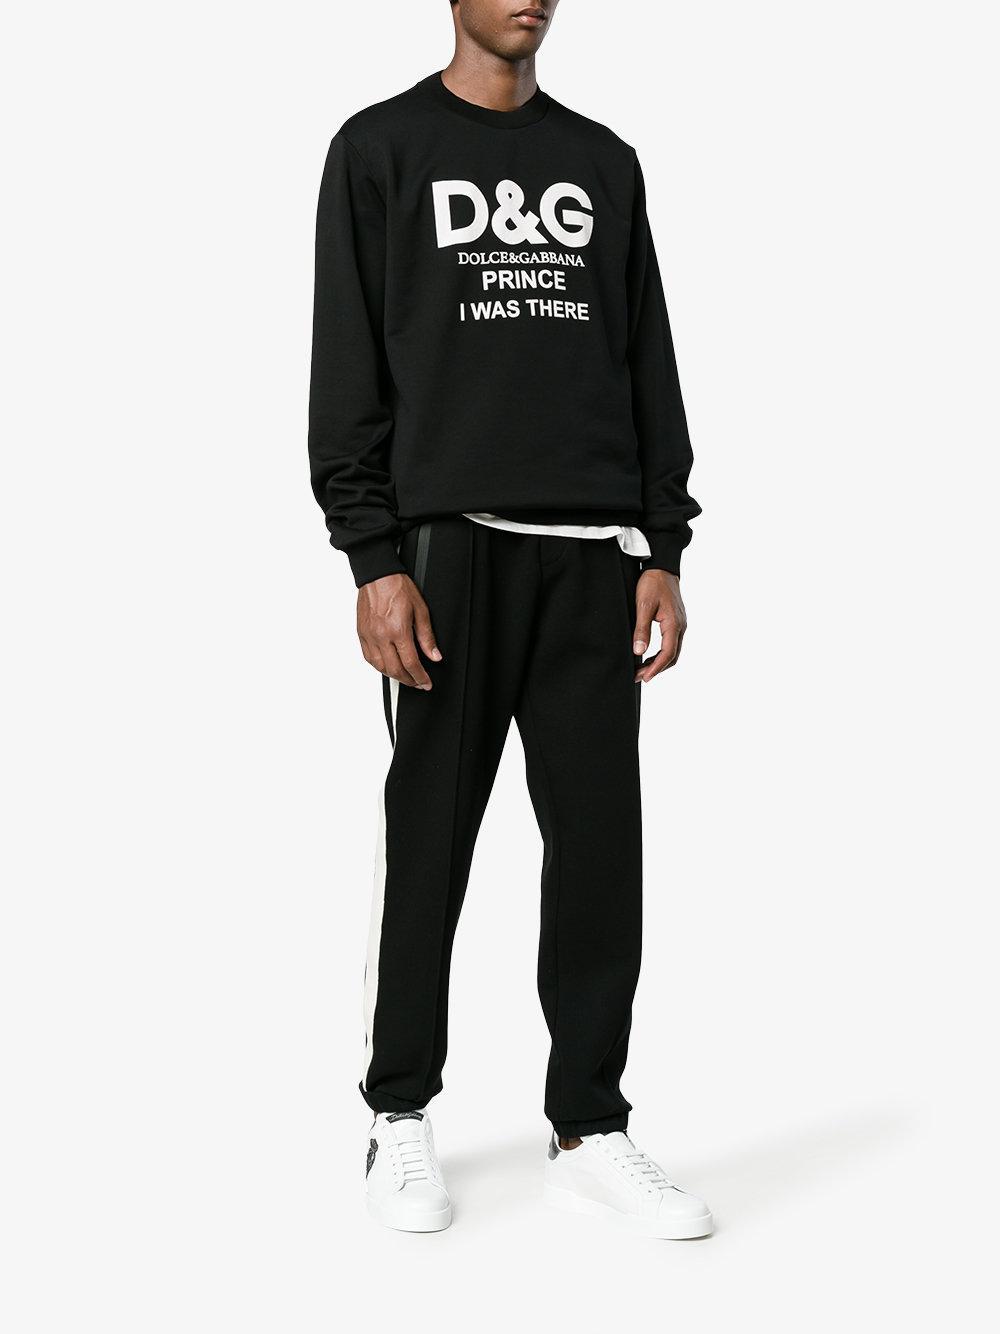 Dolce & Gabbana Cotton Logo Print Sweatshirt in Black for Men